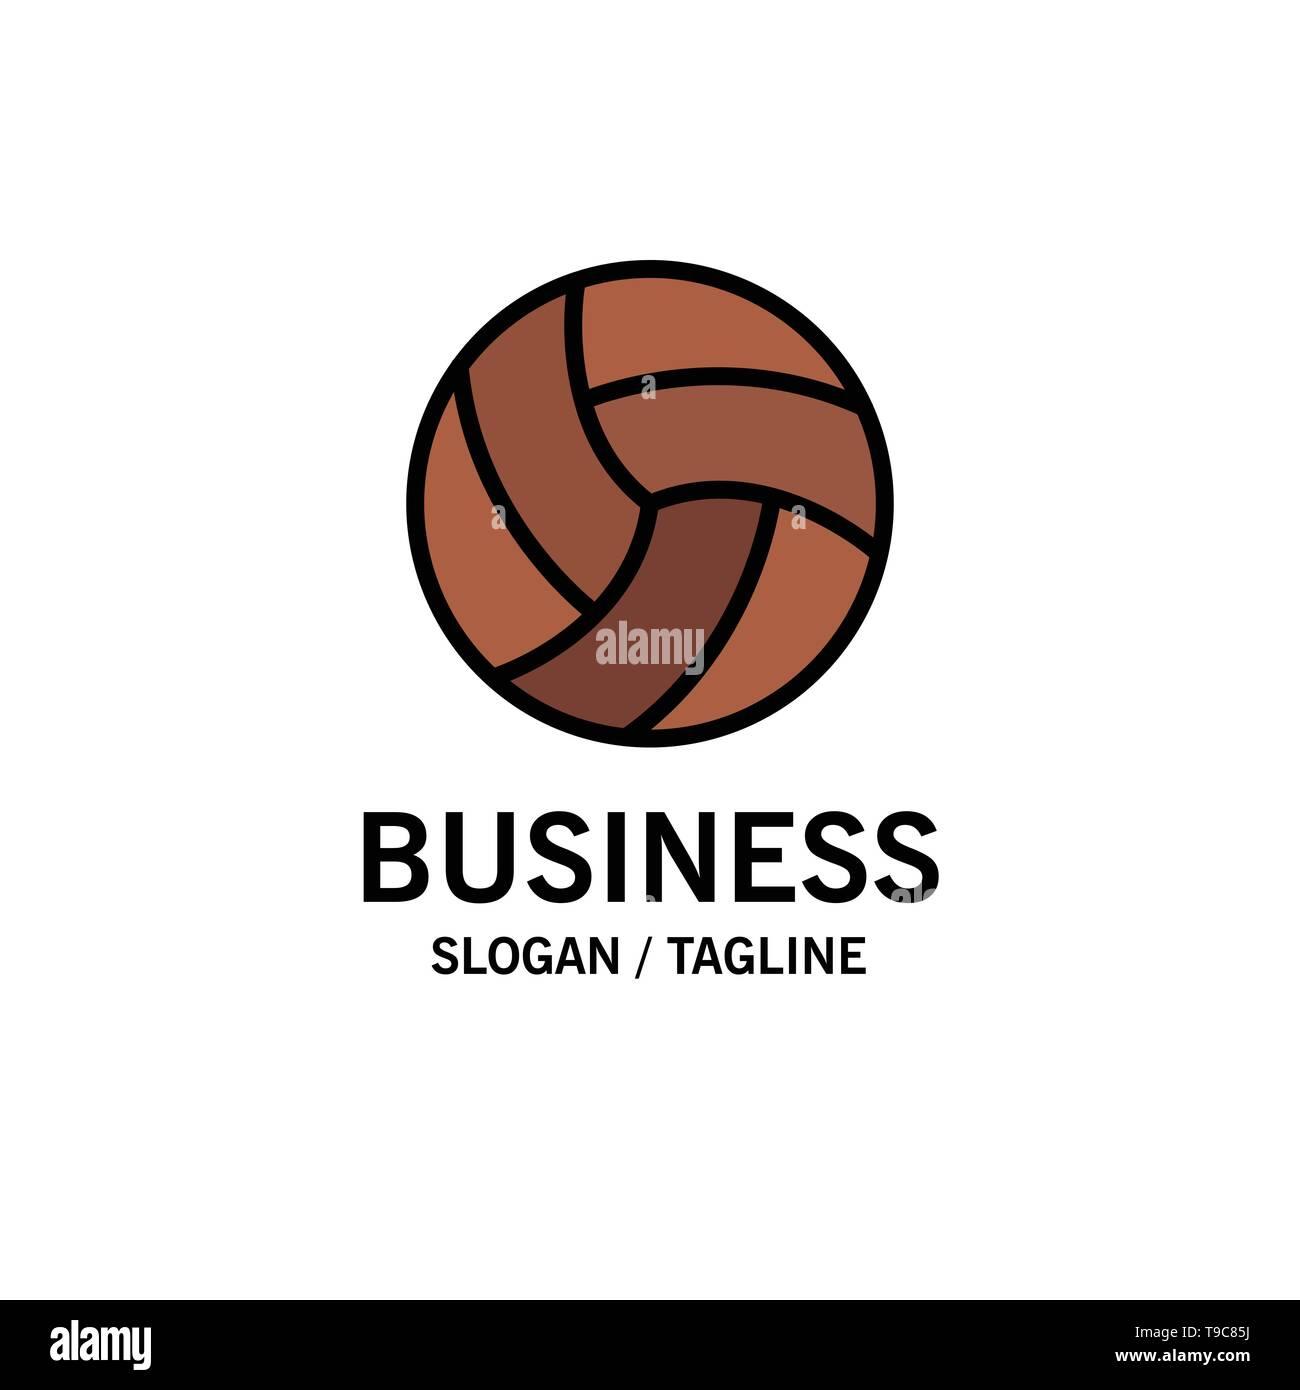 73785a381f2 Pelota, voleibol, voleibol, deporte negocios Logo Plantilla. Color plano  Imagen De Stock